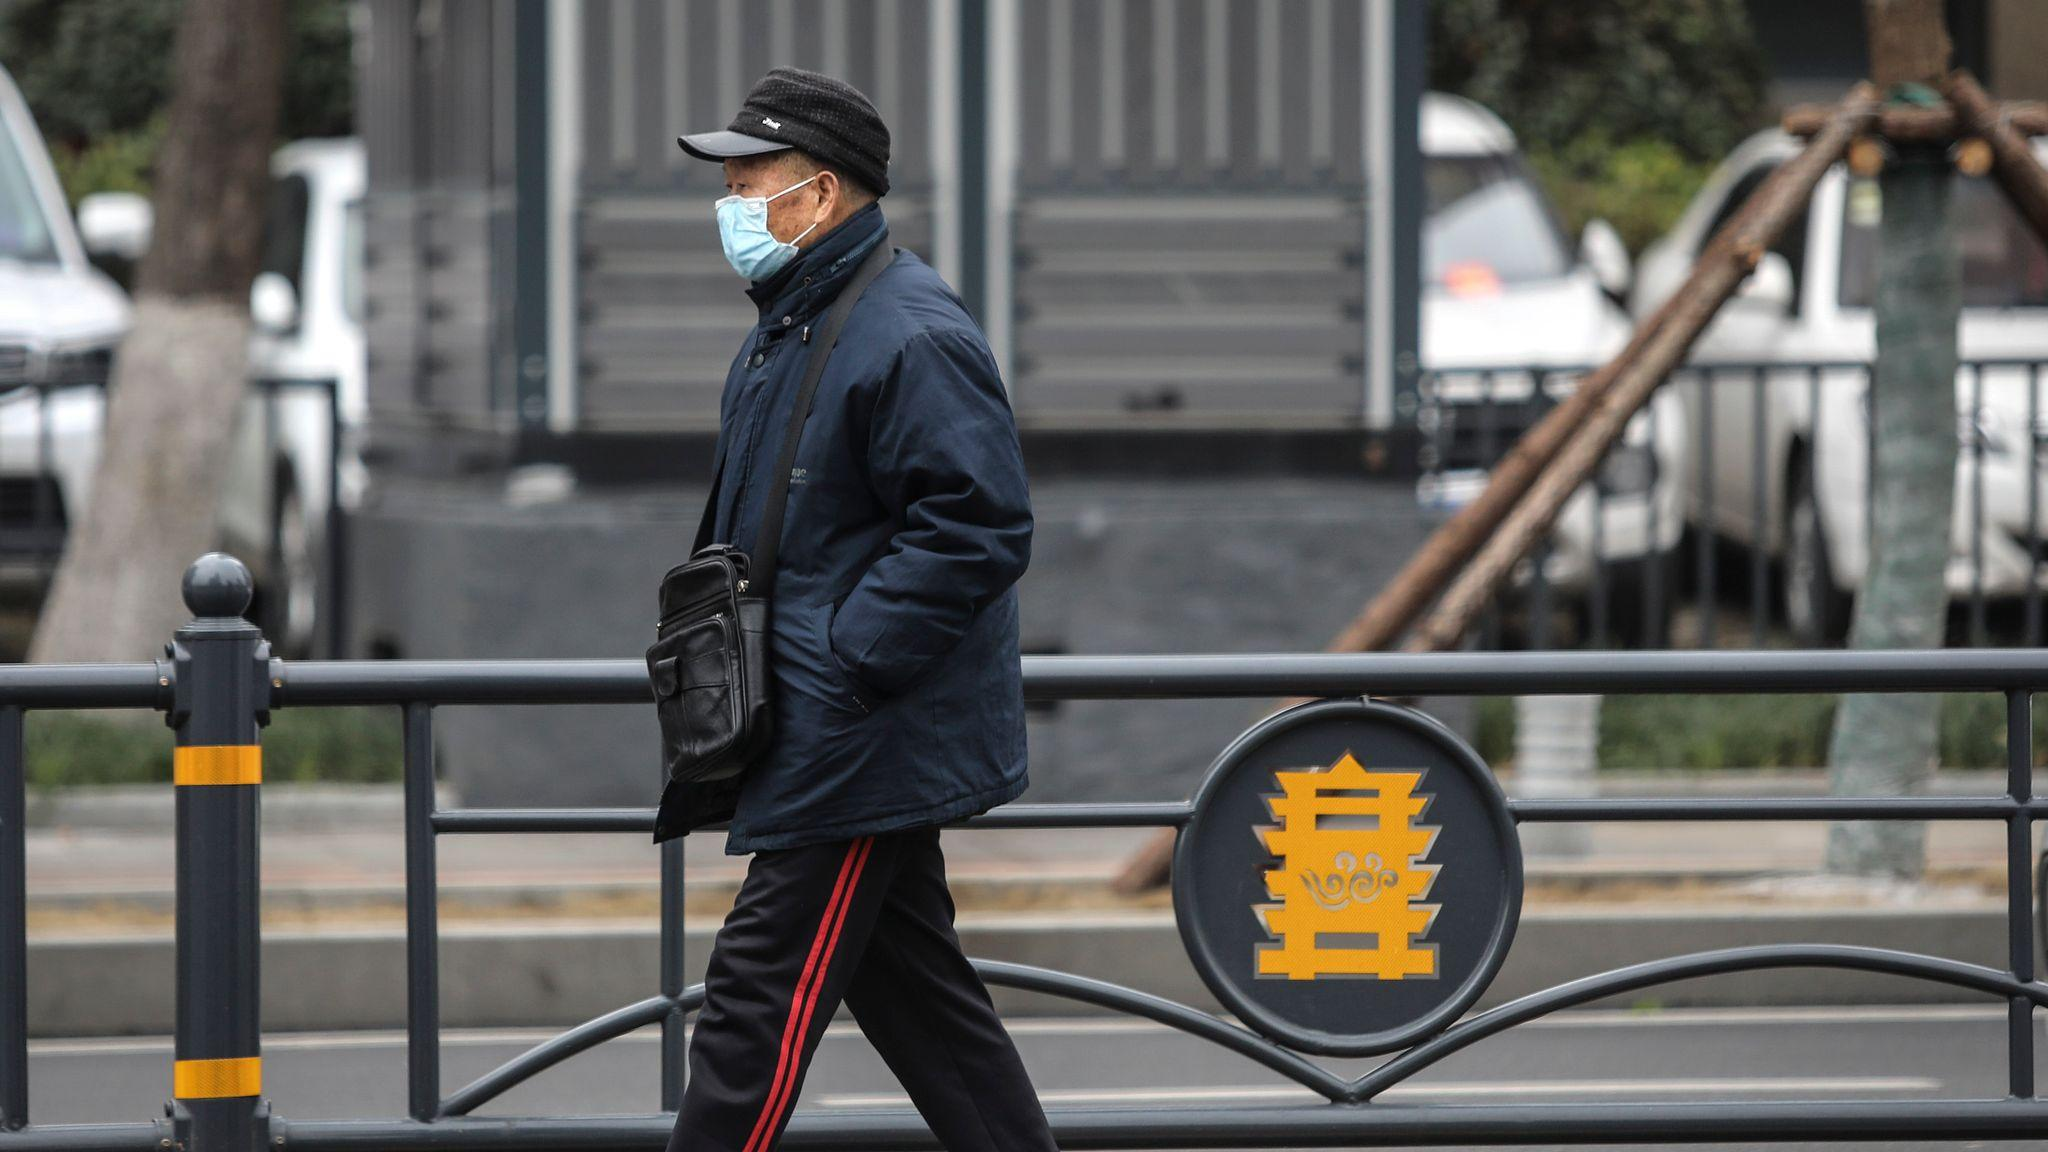 China reports 17 more cases of new virus strain зурган илэрцүүд